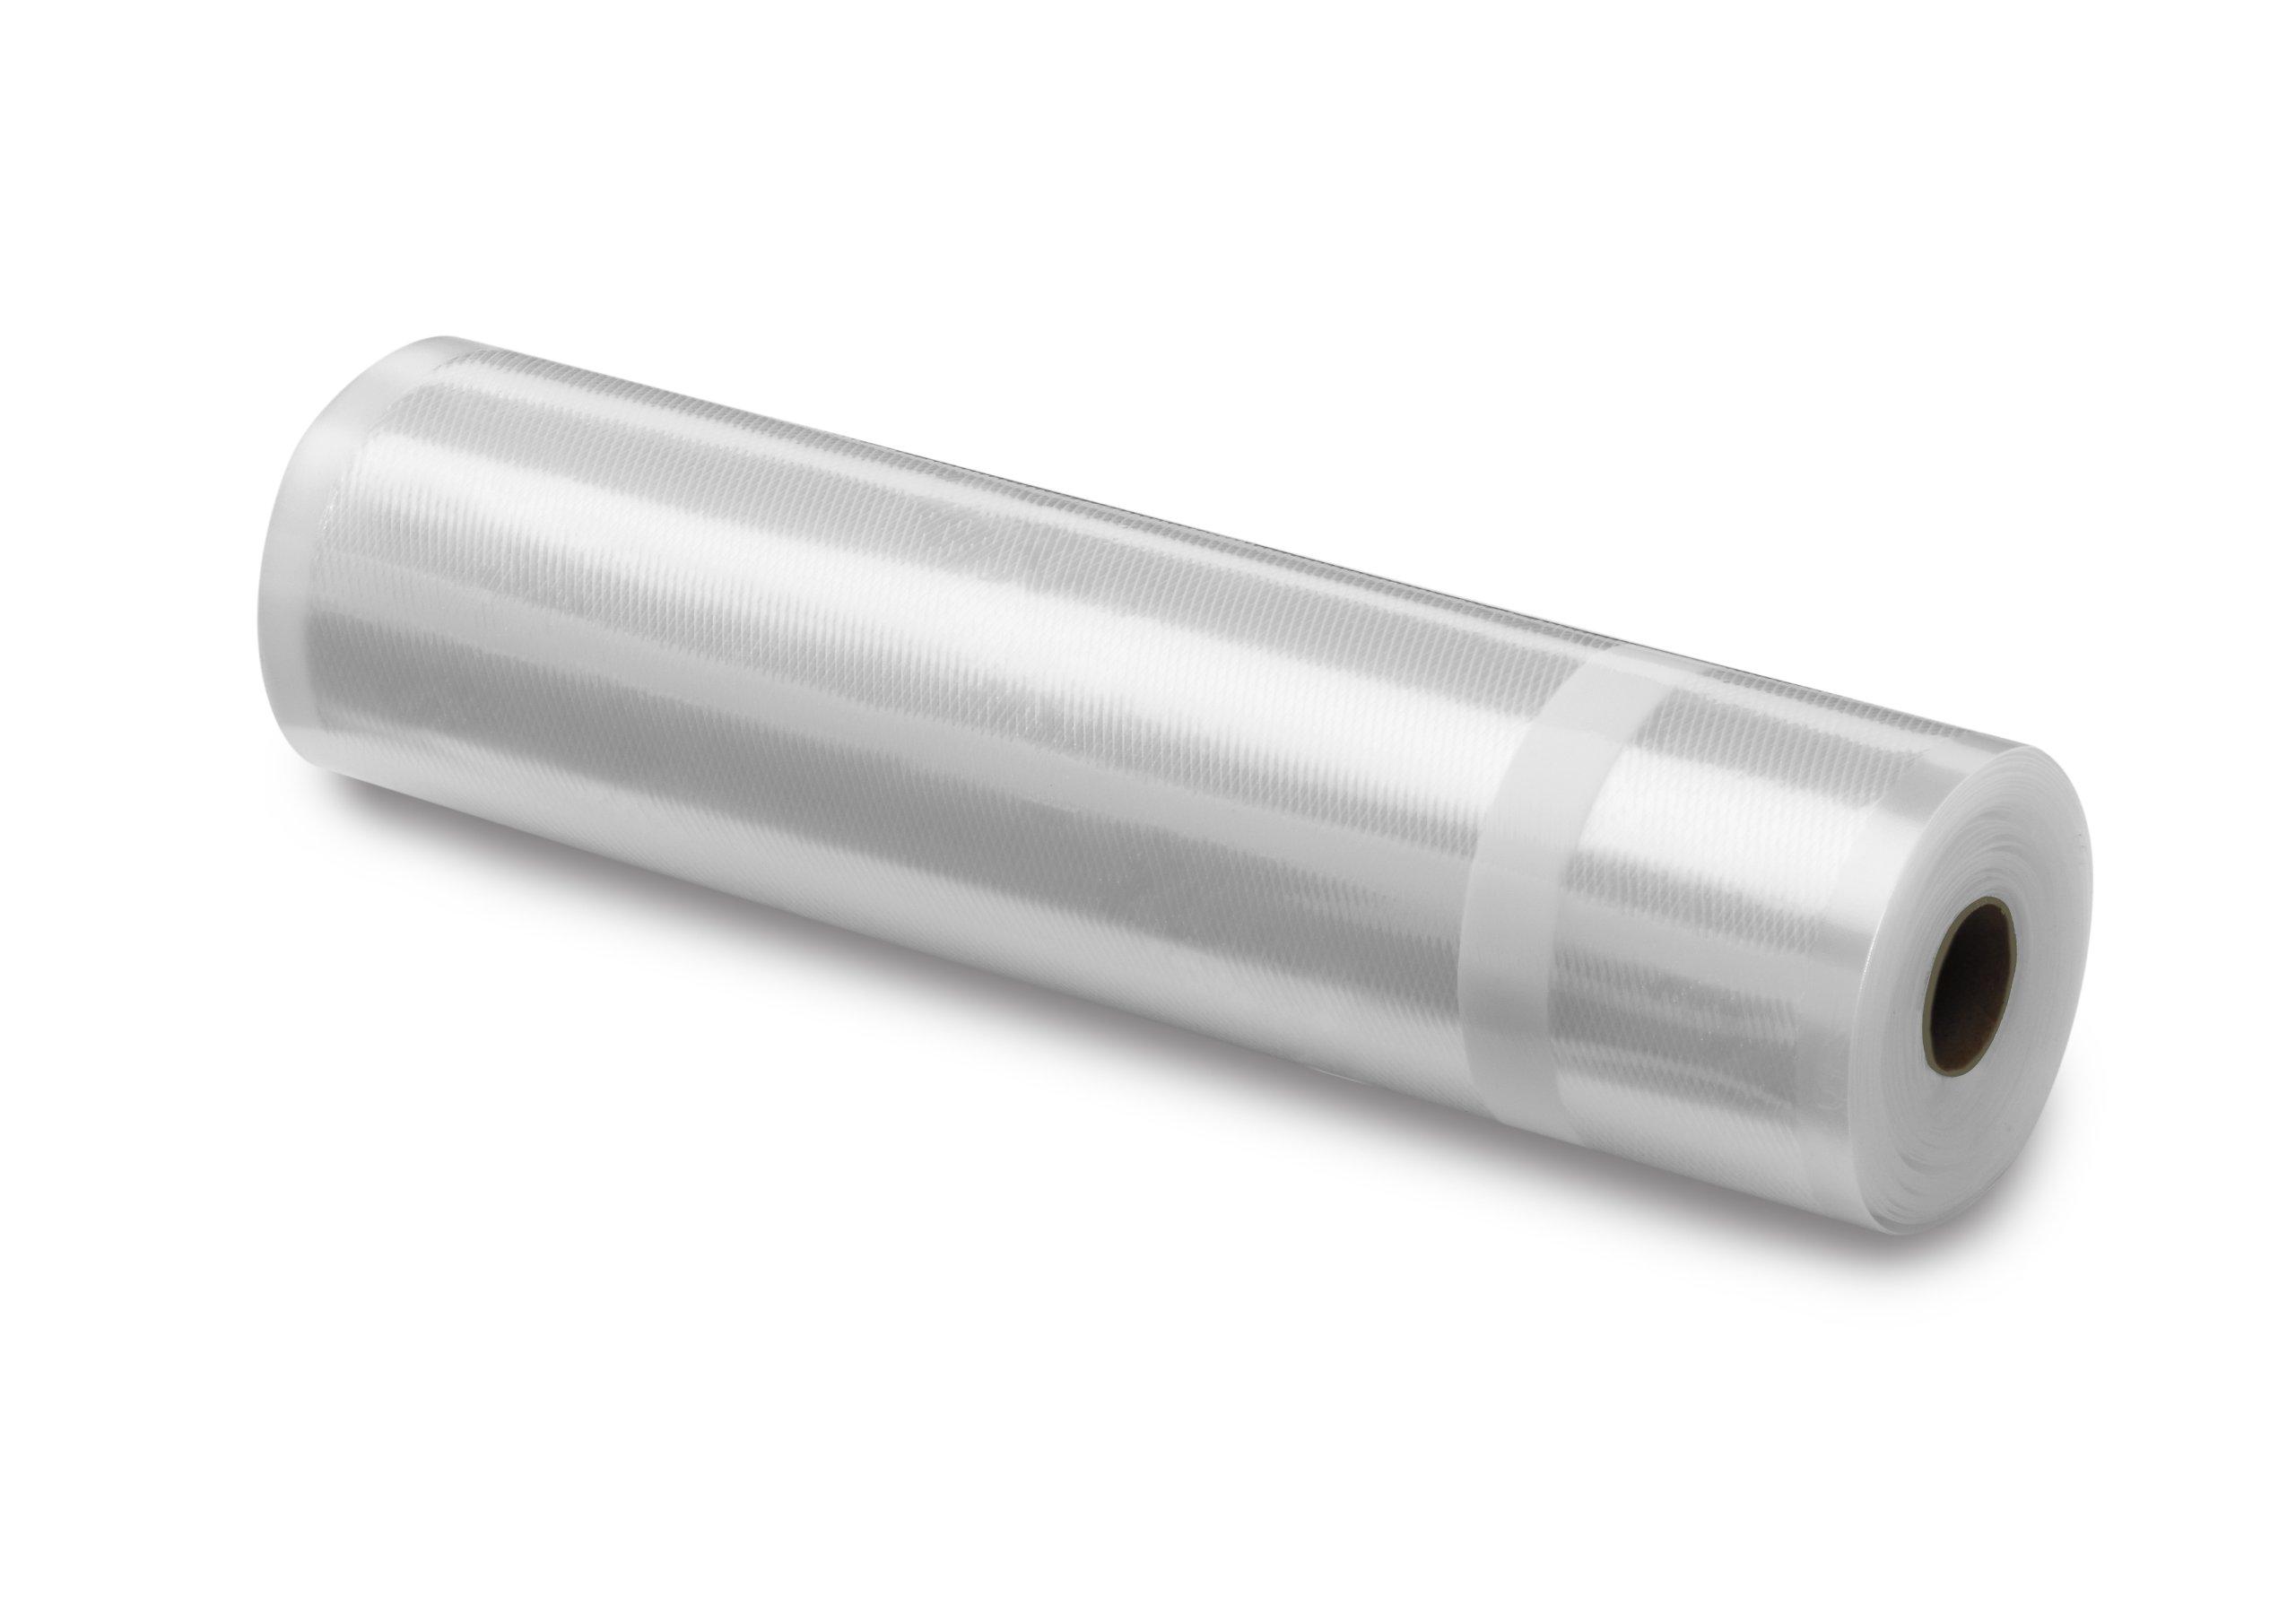 Cuisinart VSB-112 Vacuum Sealer Bag Rolls, 11-Inch, 2-Pack by Cuisinart